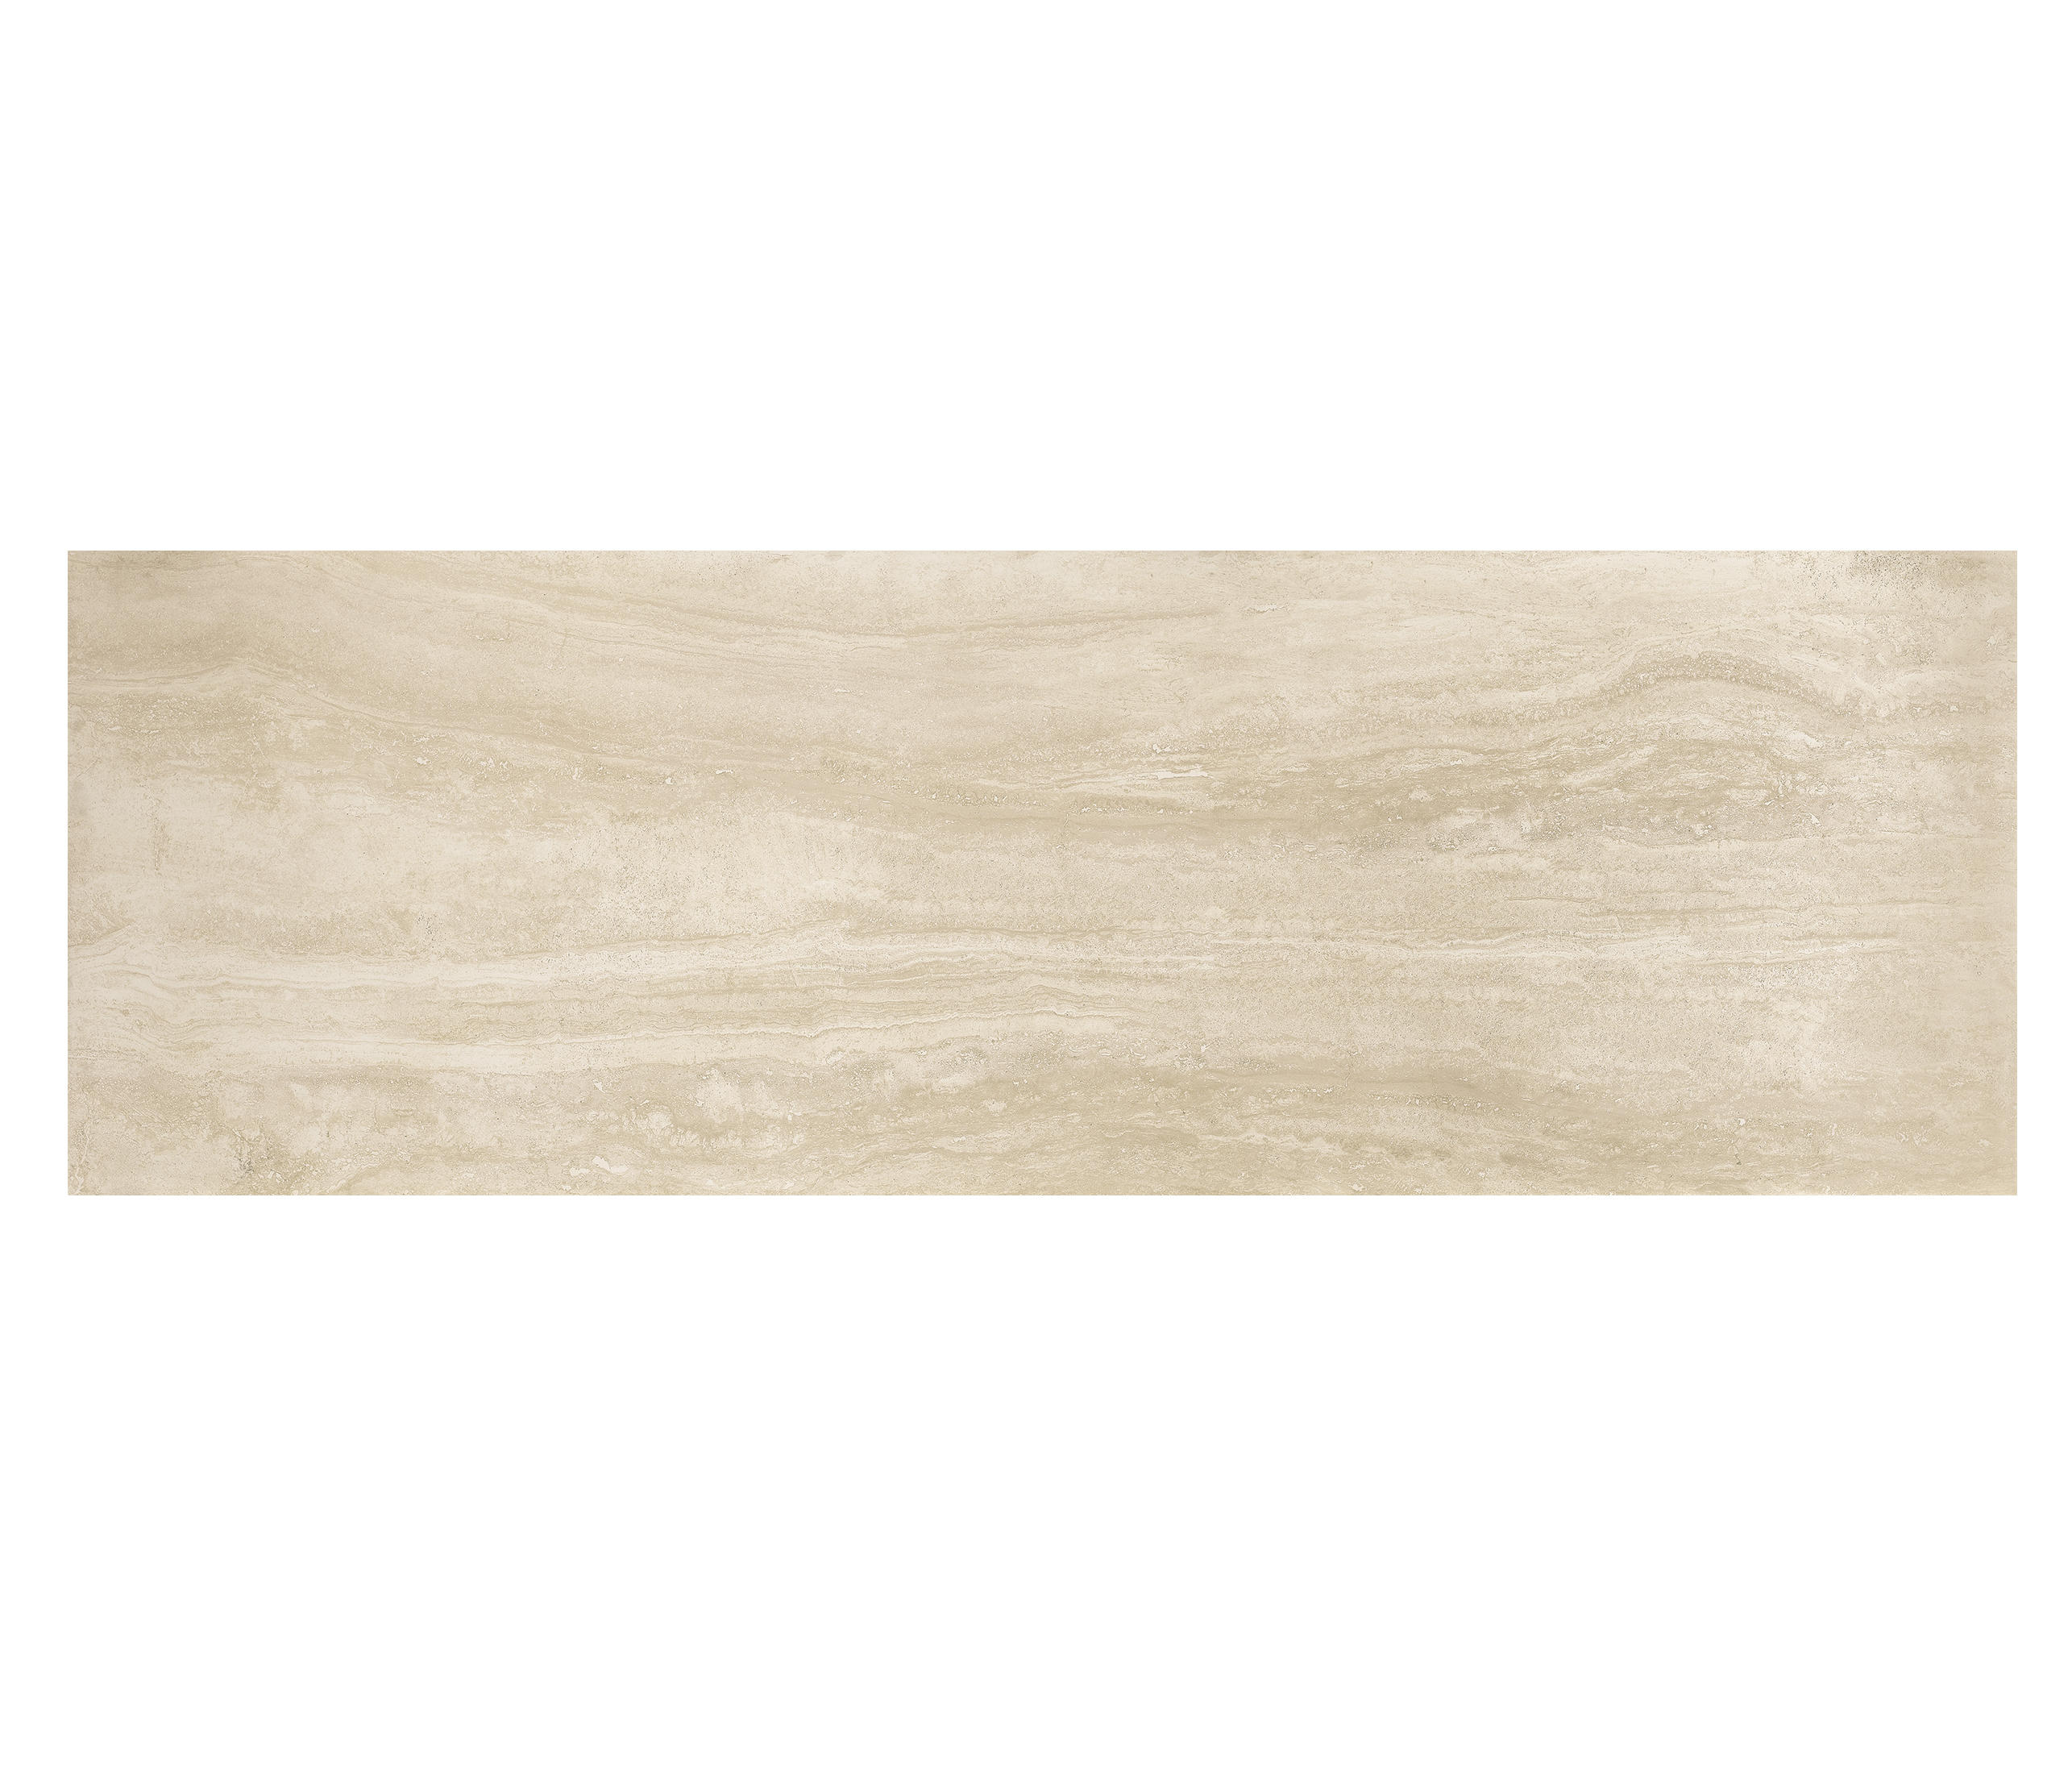 Laminam i naturali travertino romano polished floor for Travertino romano